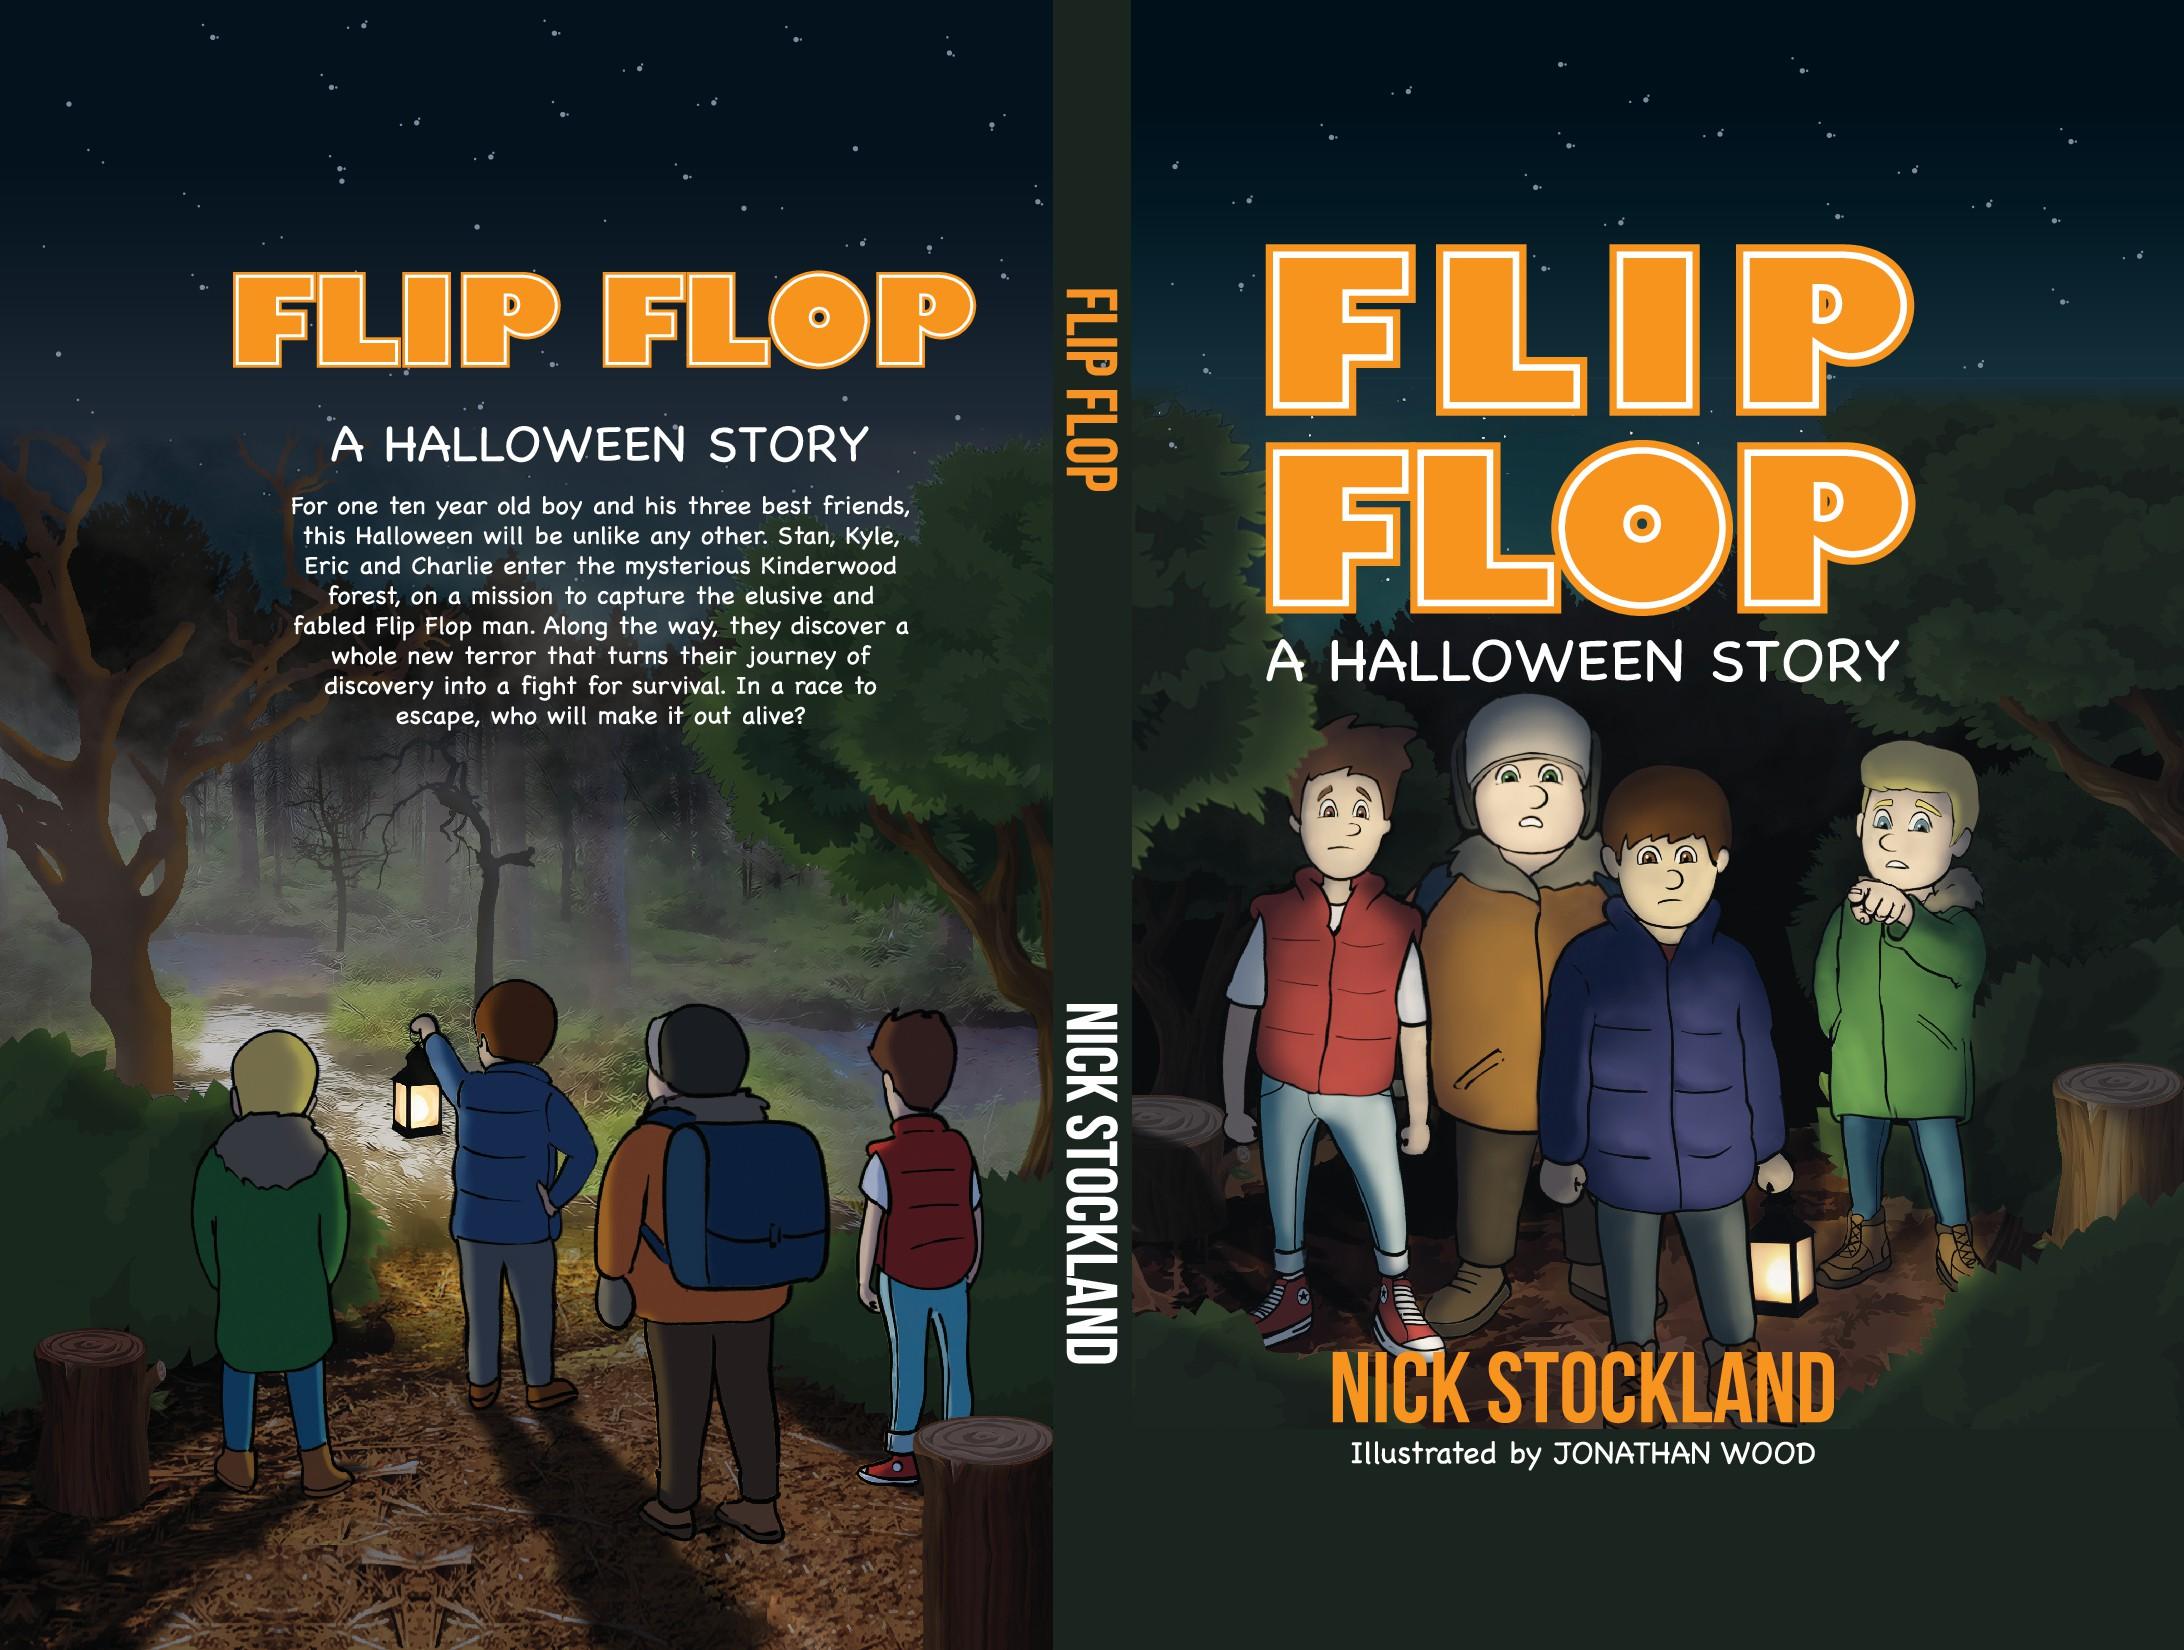 Book Cover Design for a Children's book: Flip Flop - A Halloween Story